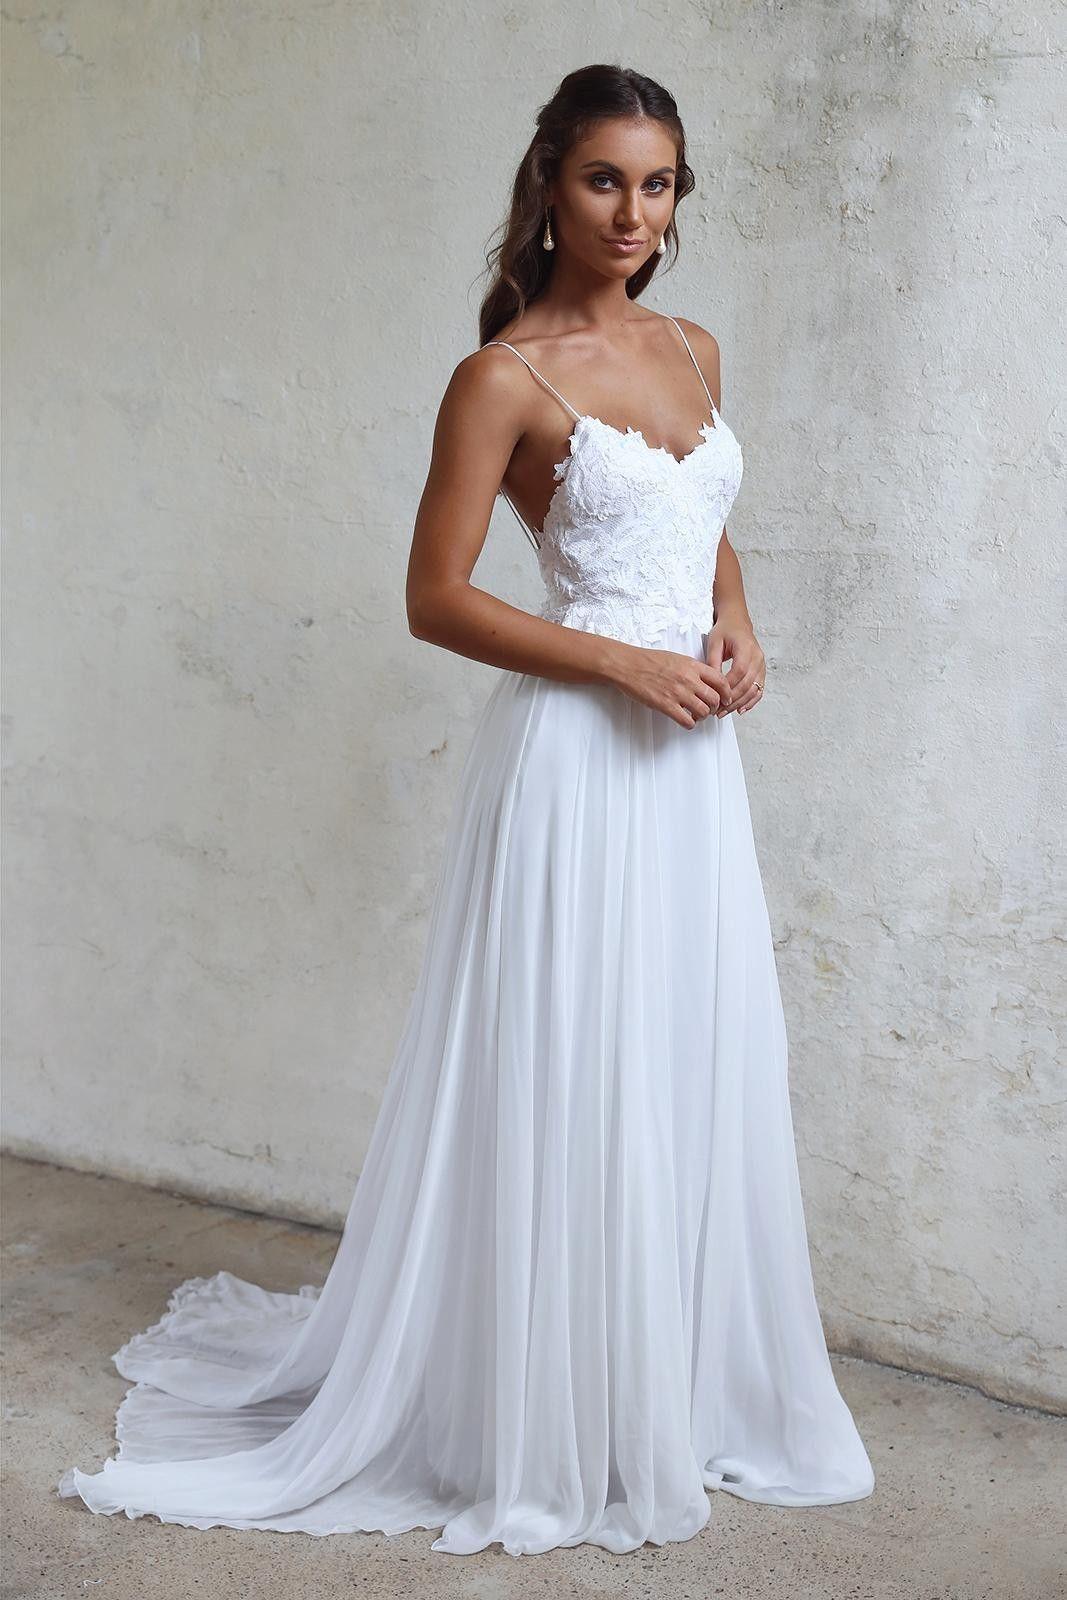 Simple Spaghetti Strap Wedding Dresses